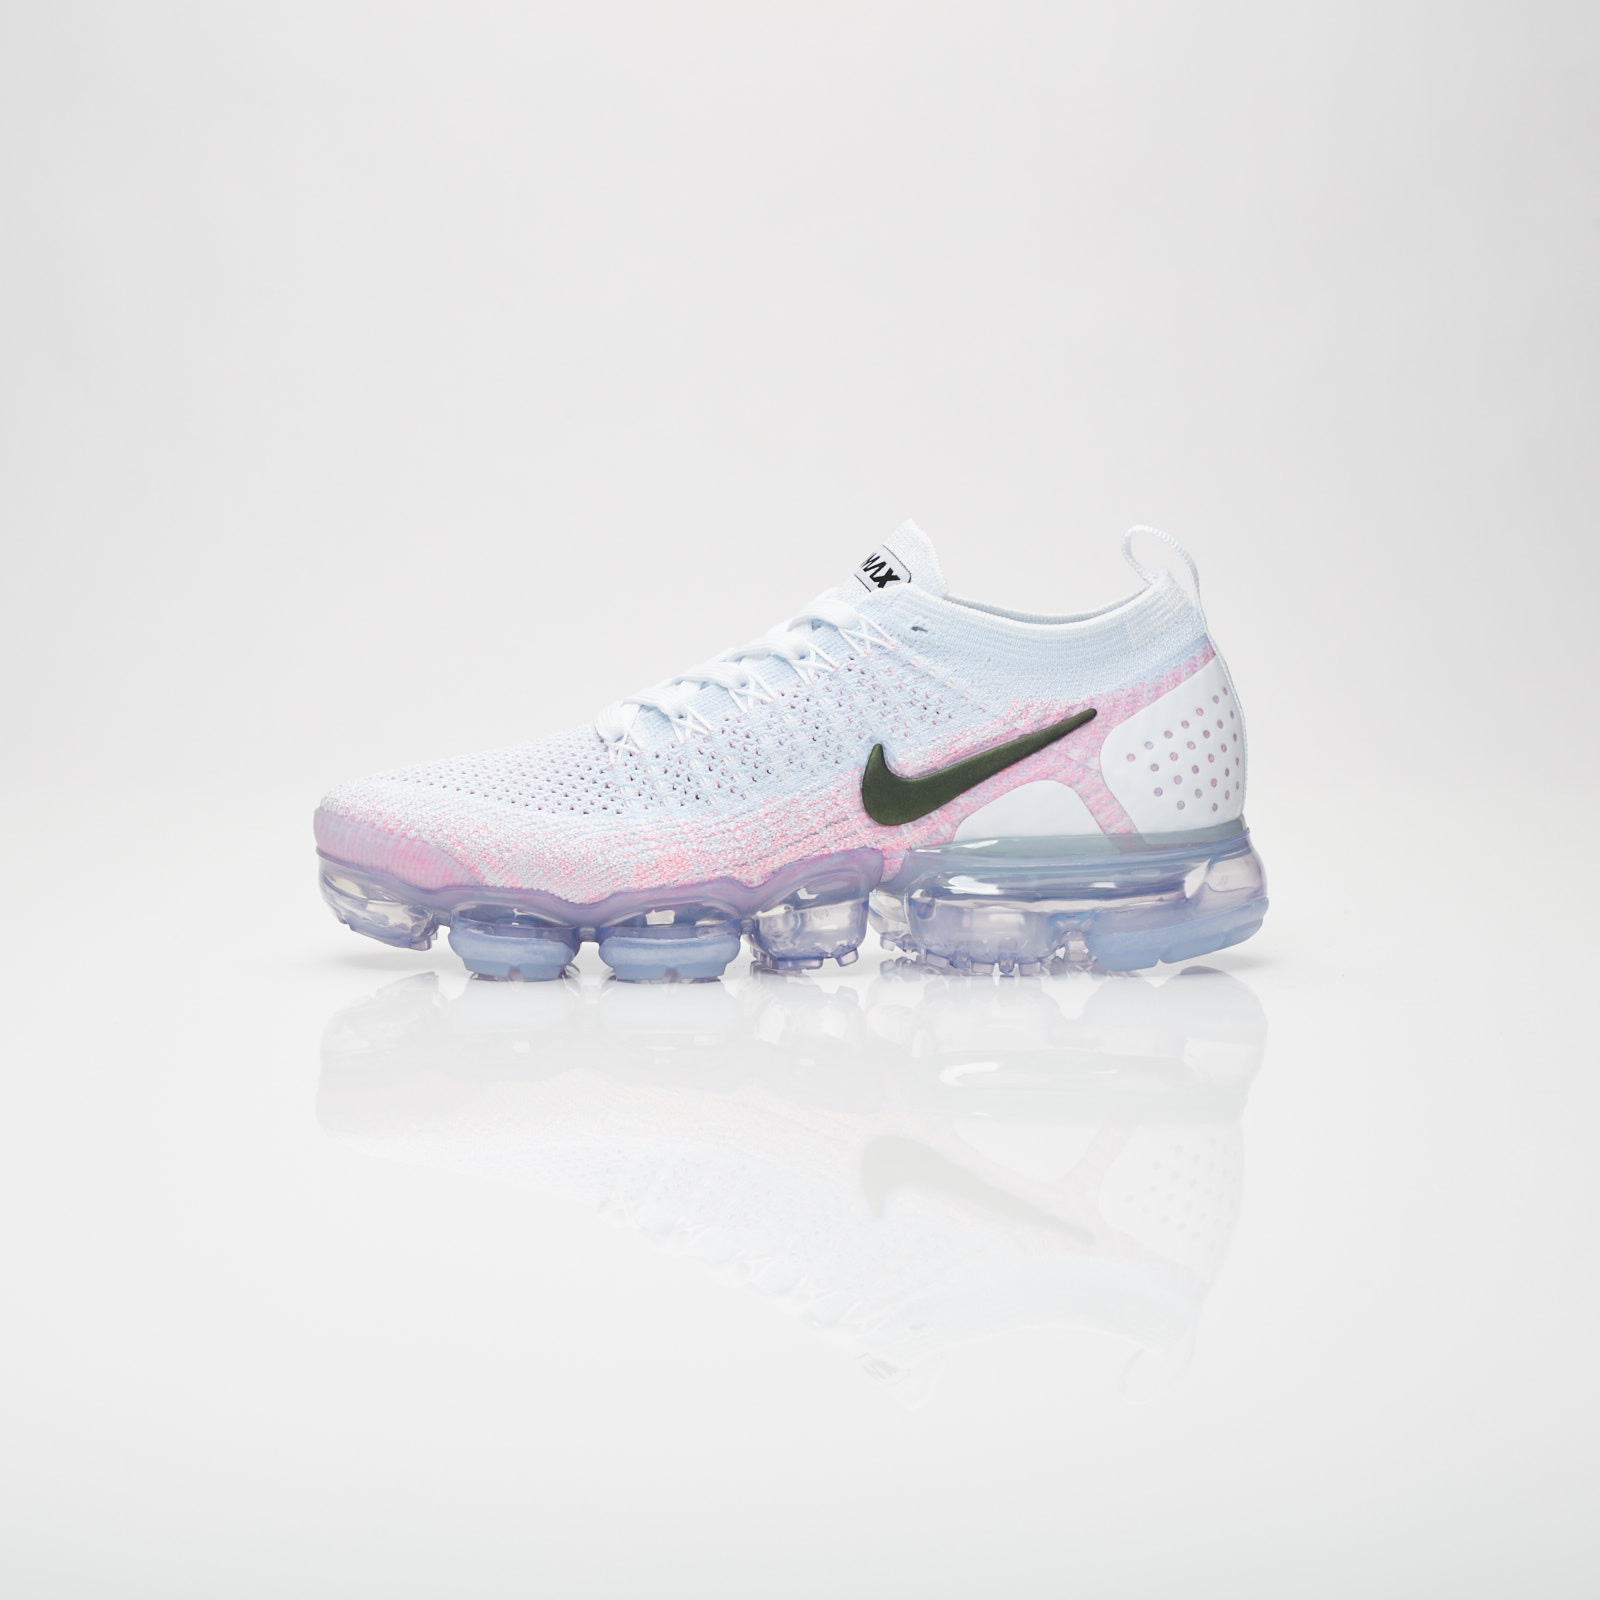 Nike Wmns Air Vapormax Flyknit 2 - 942843-102 - Sneakersnstuff ... eb3c31b08